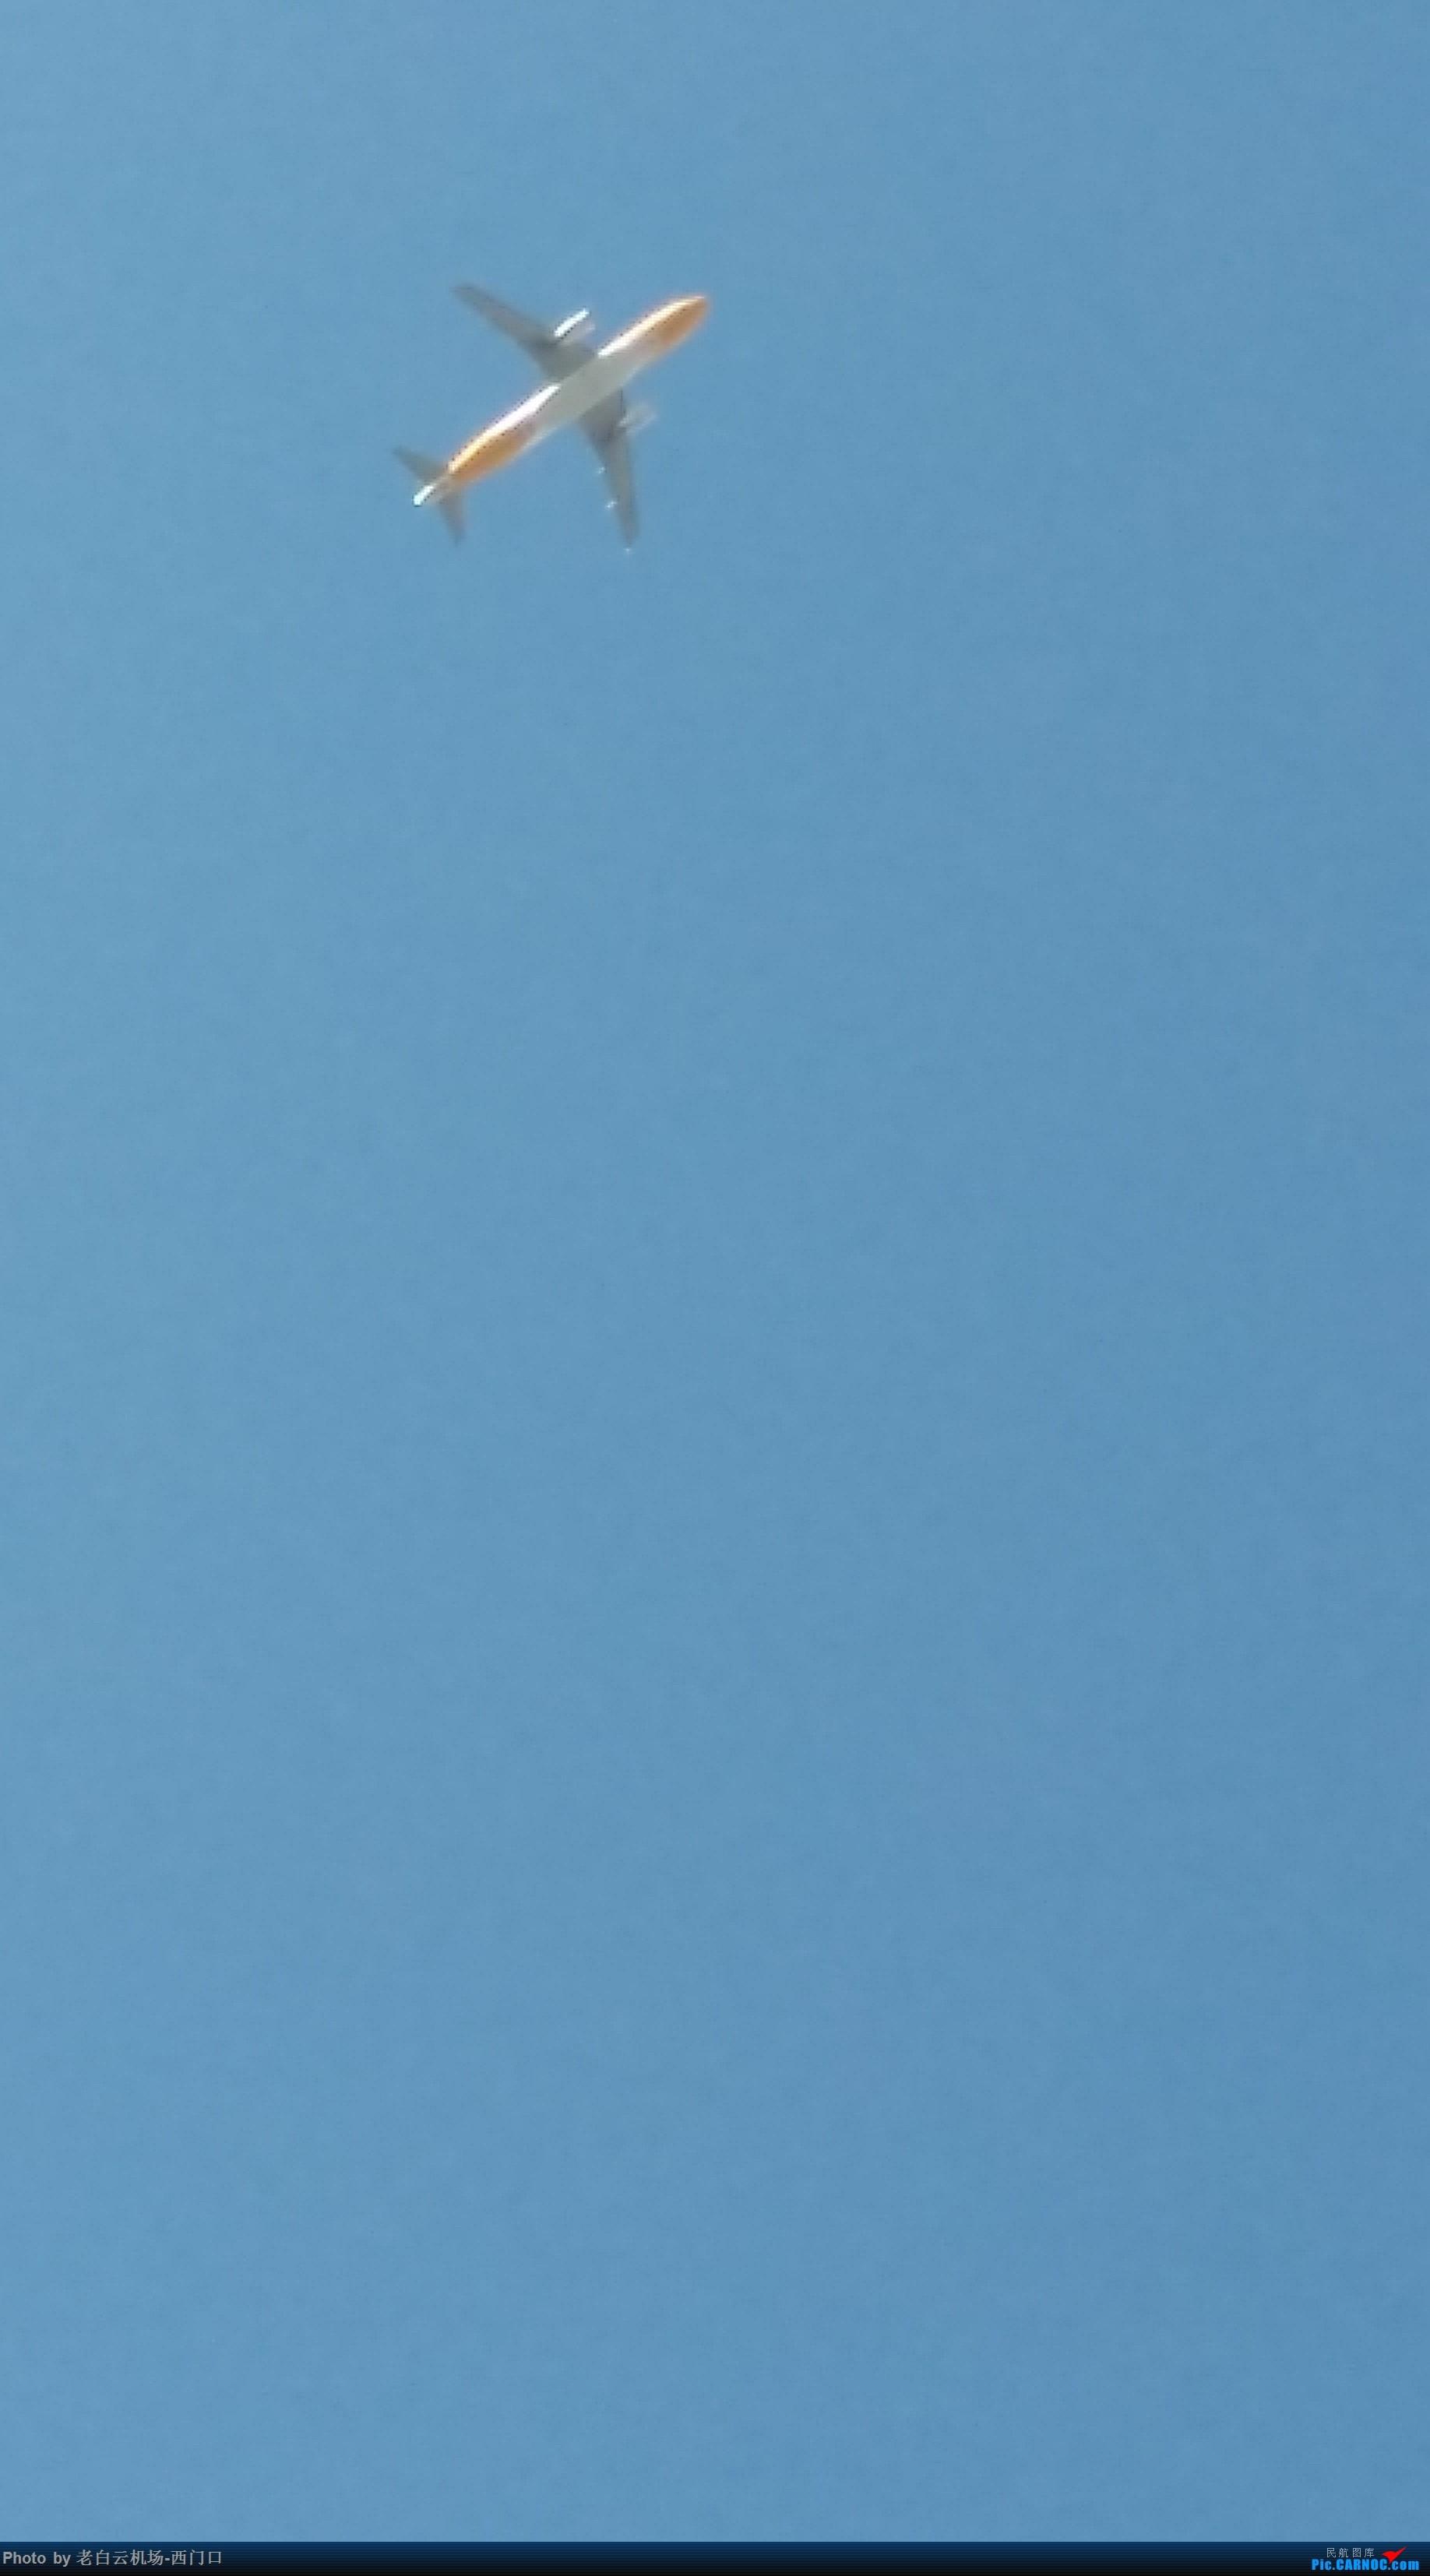 Re:[原创]我的拍飞机心情(广州) BOEING 787-9 不明 中国广东省广州市荔湾区四中聚贤中学上空